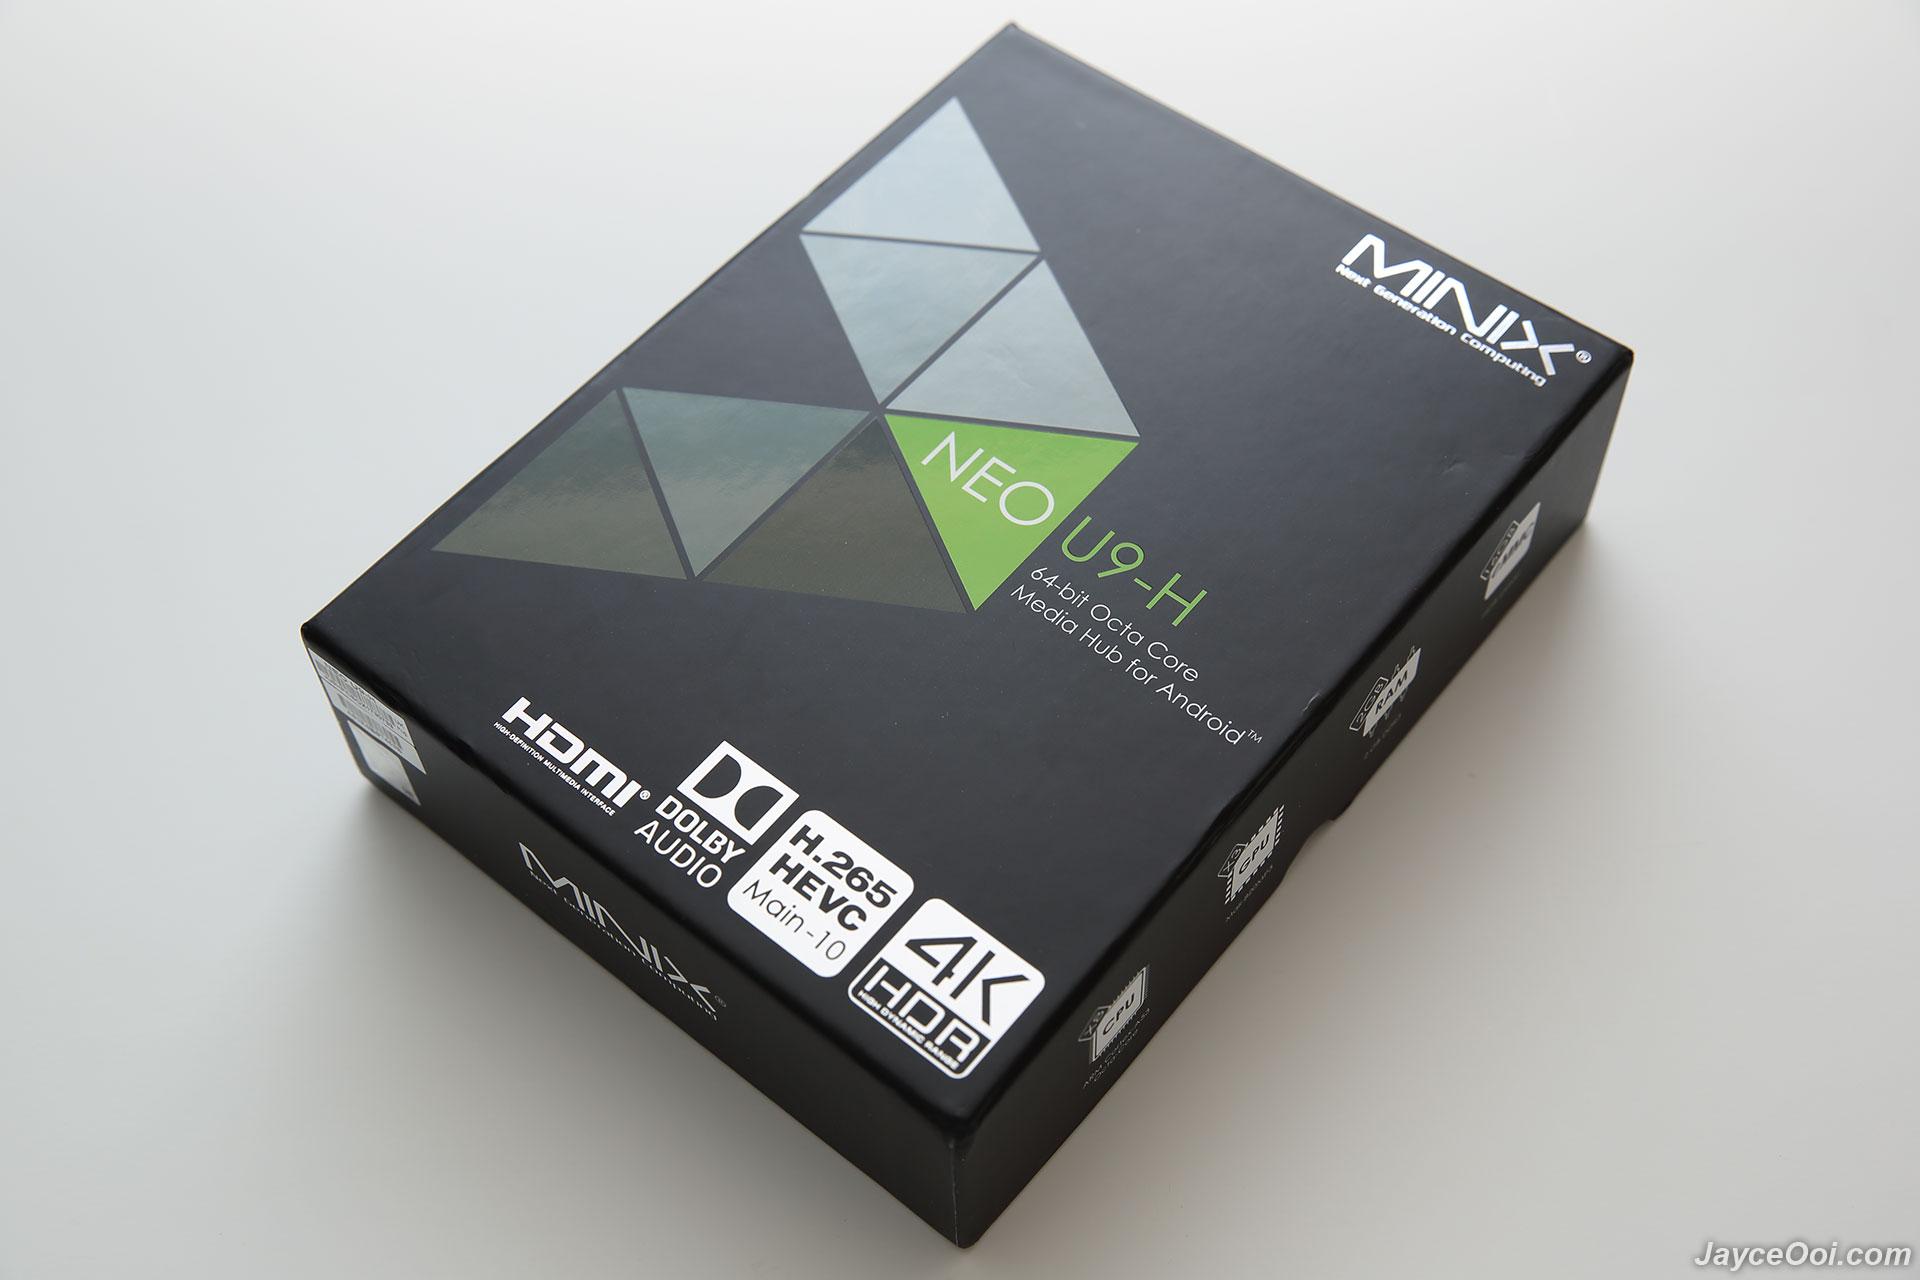 Minix Neo U9 H Review Jayceooi Com